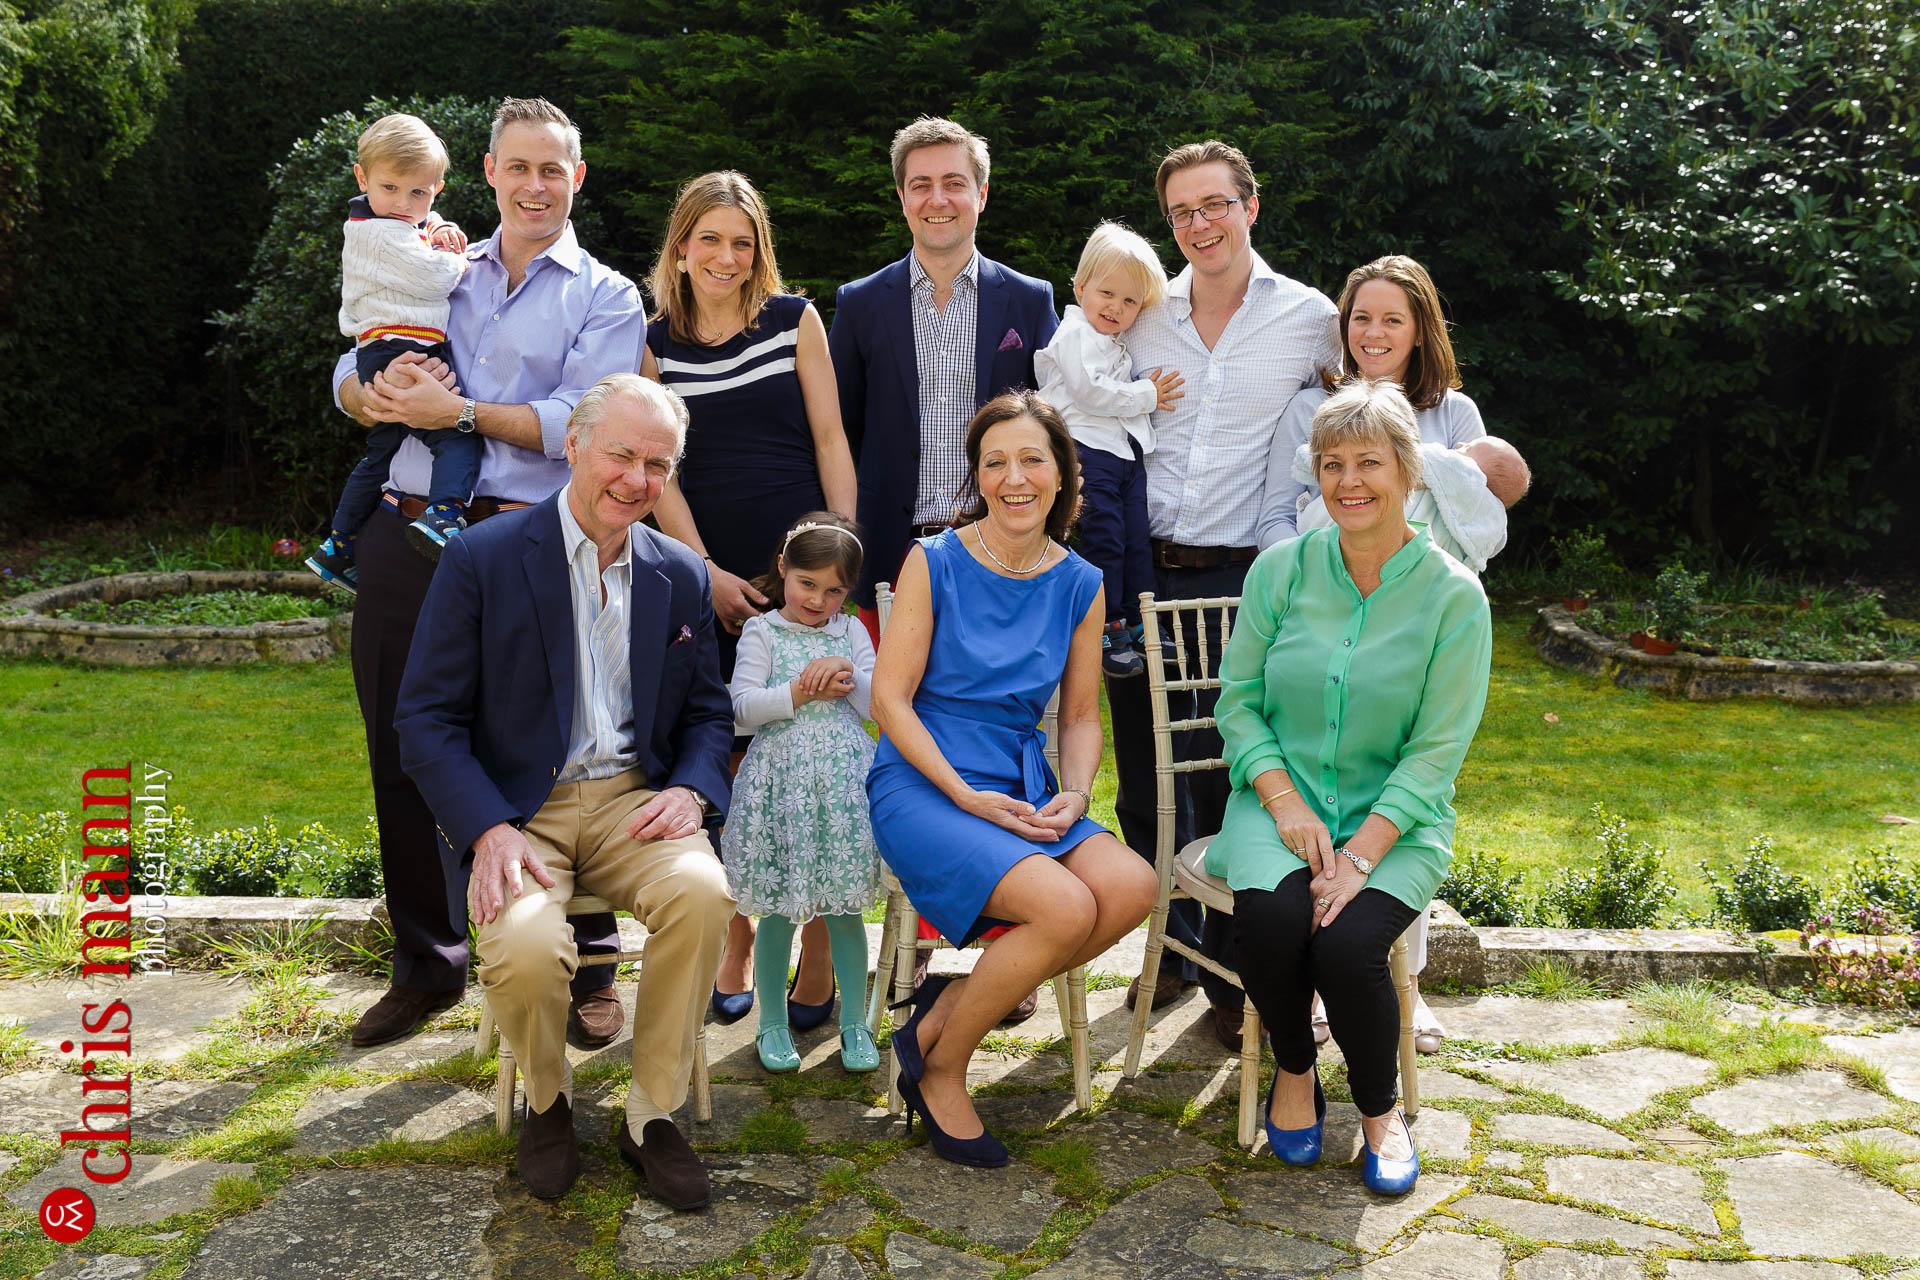 family group photo in garden